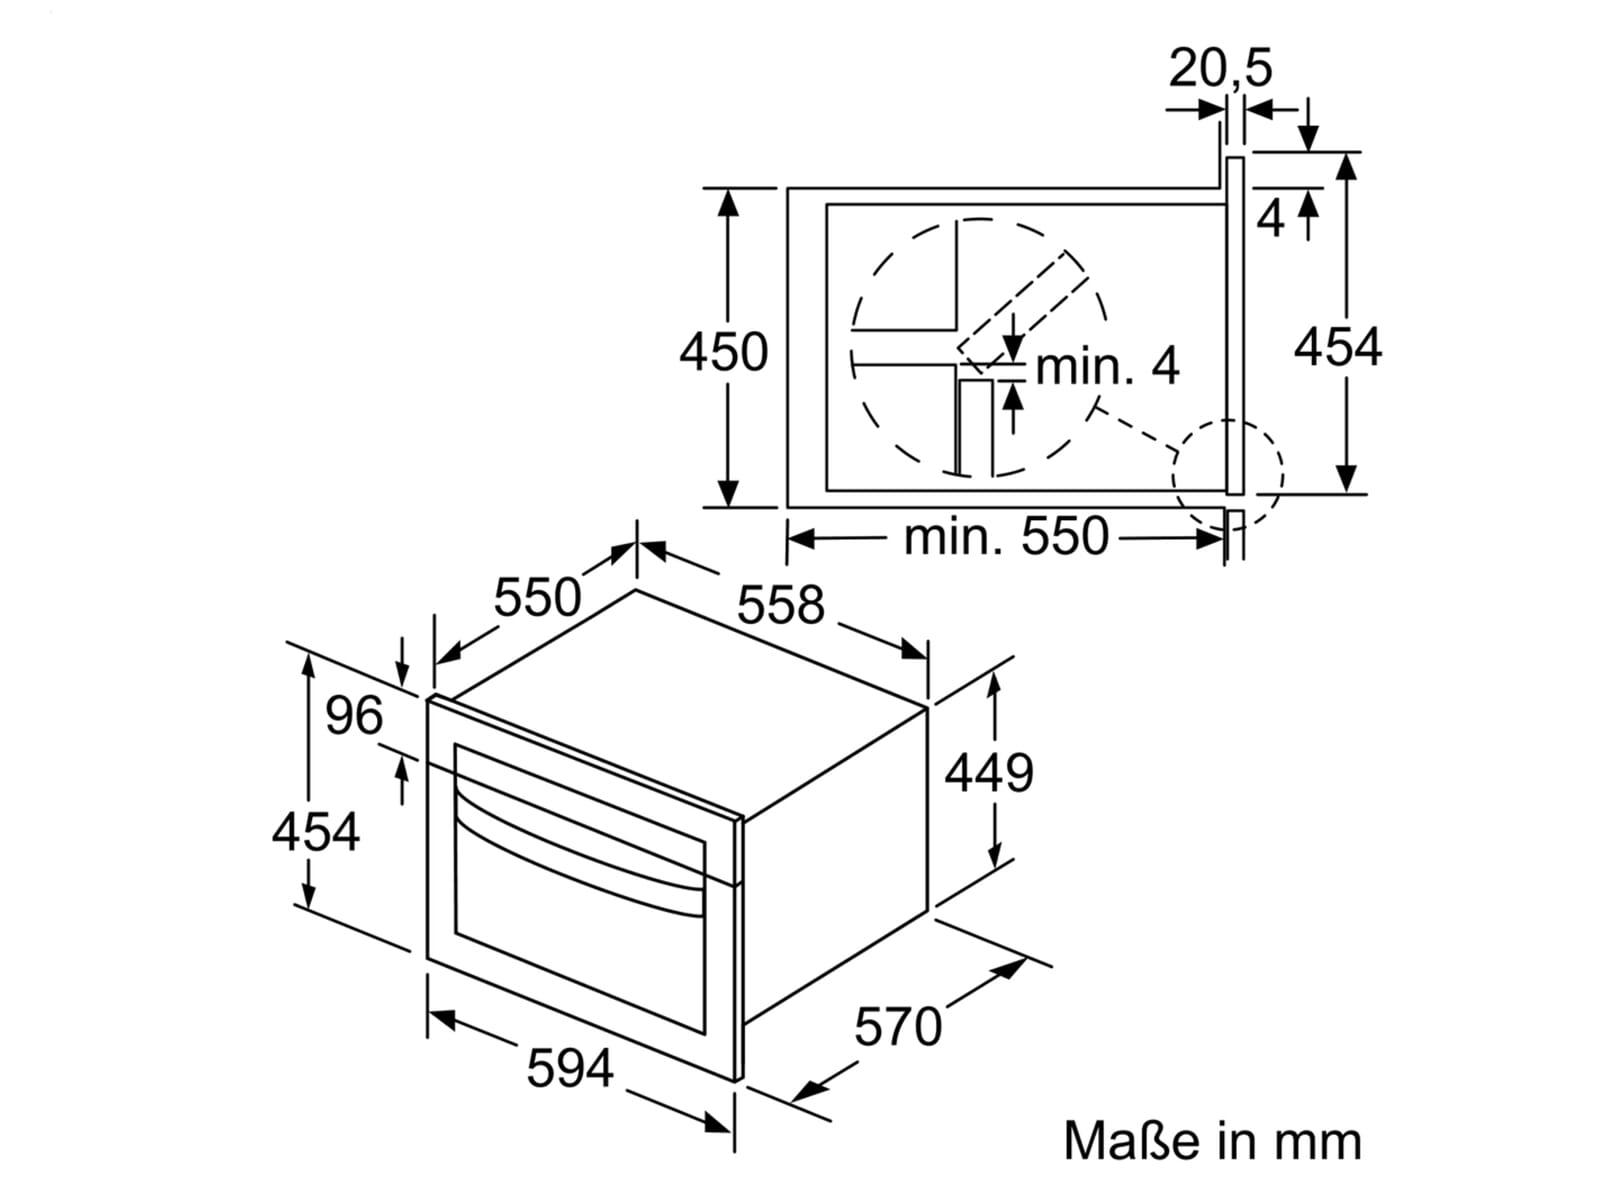 Bosch CMA585GS0 Kompaktbackofen mit Mikrowelle Edelstahl